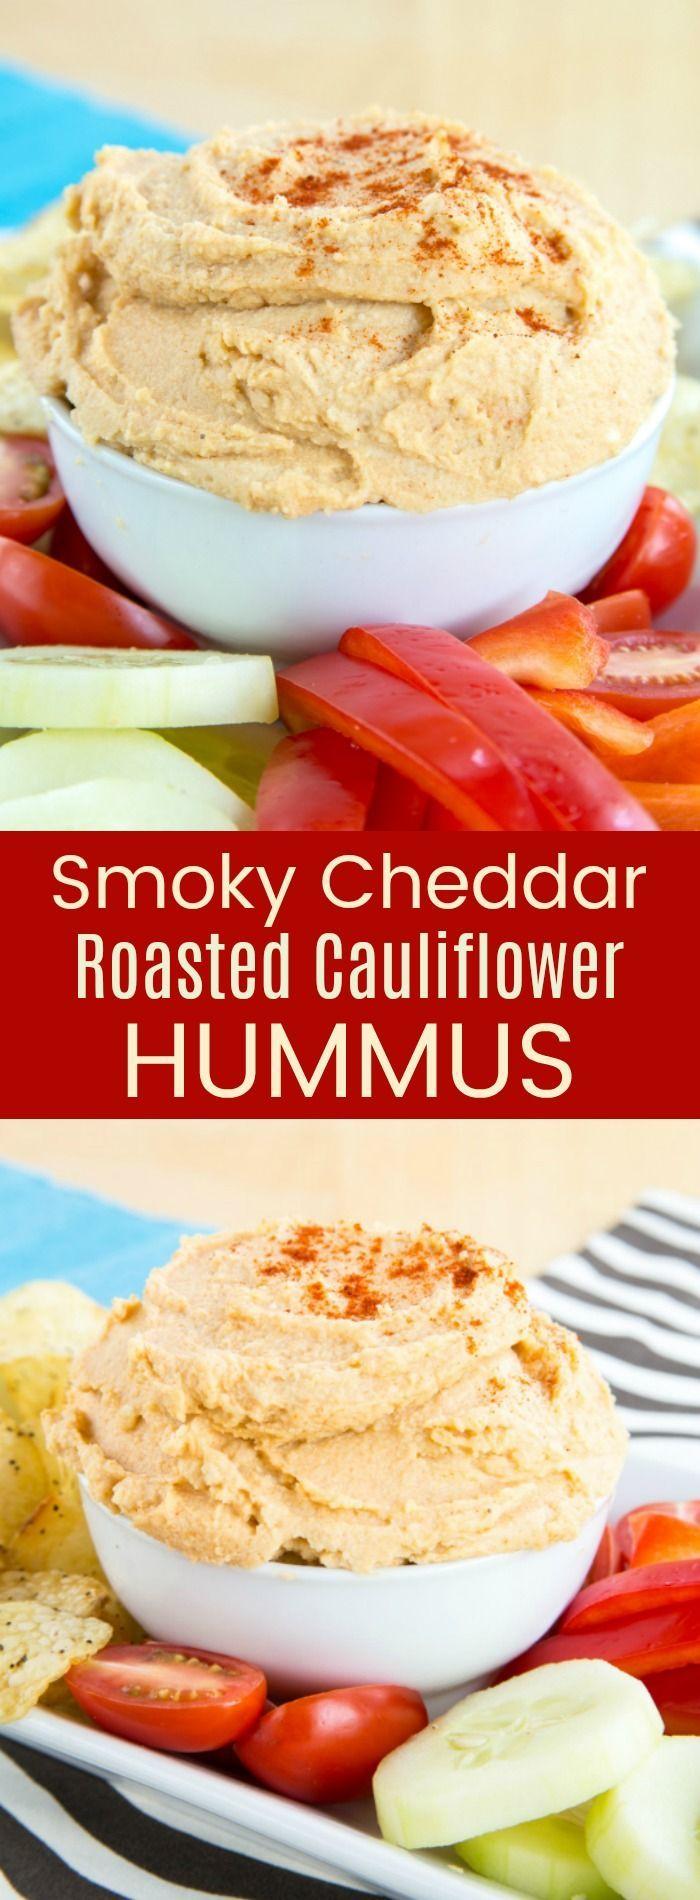 Smoky Cheddar Roasted Cauliflower Hummus  > I love making chick pea hummus at home, so I'm definitely excited to try cauliflower hummus soon!